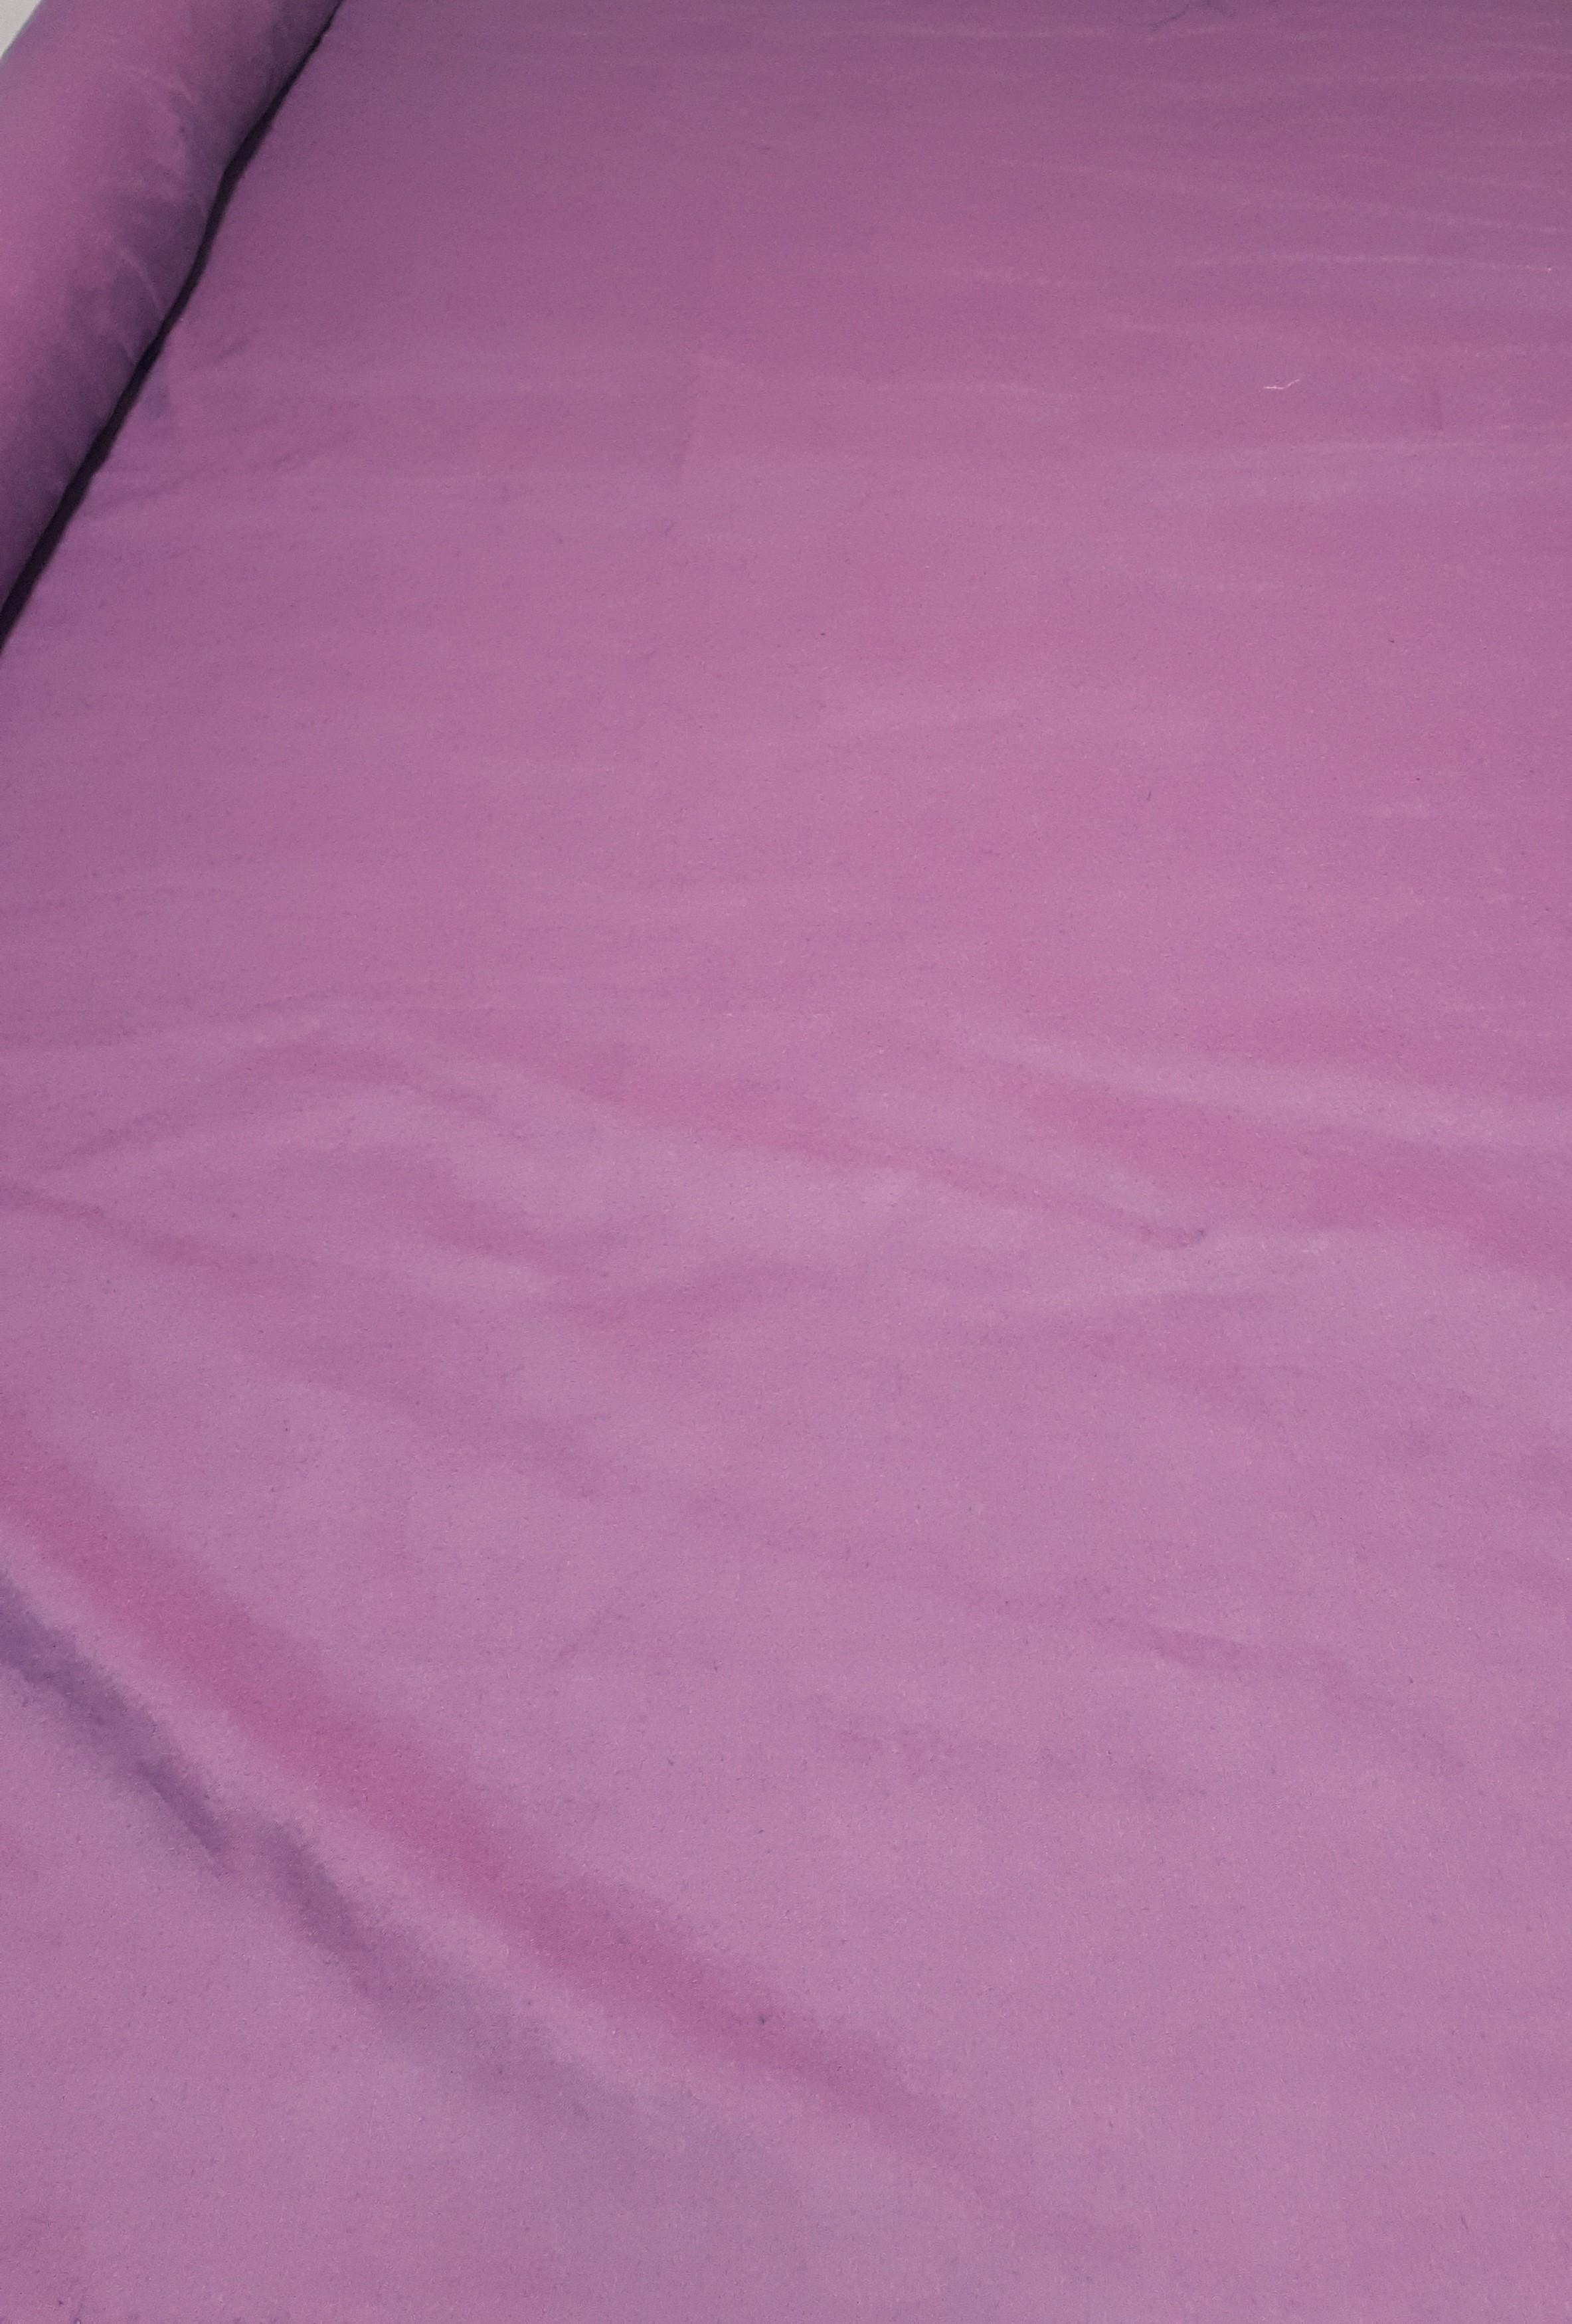 Kleitu kokvilnas audums ar hameleona efektu